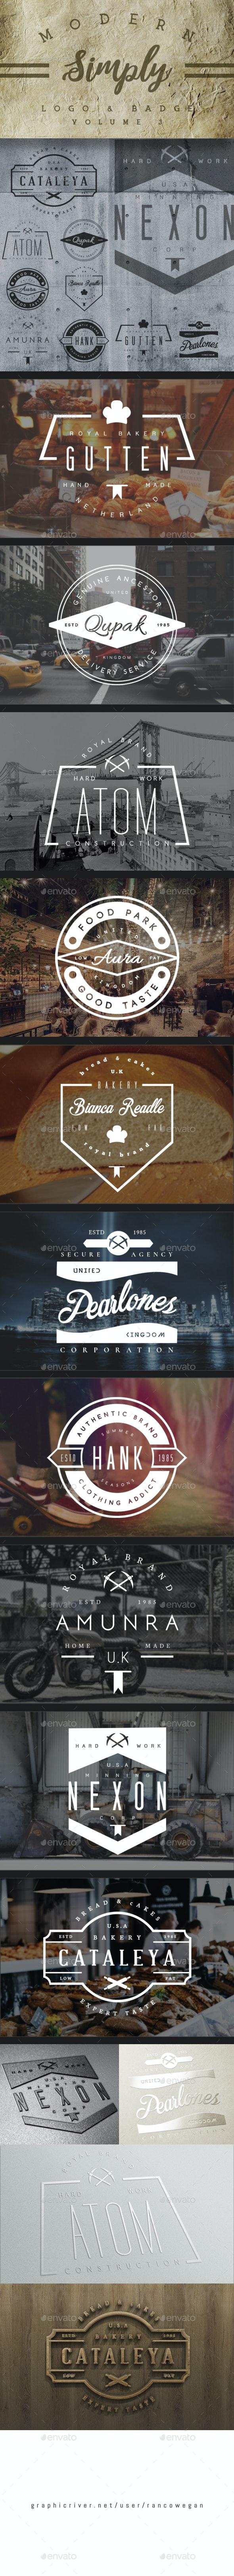 Modern Simply Logo & Badge Vol. 3 - Badges & Stickers Web Elements